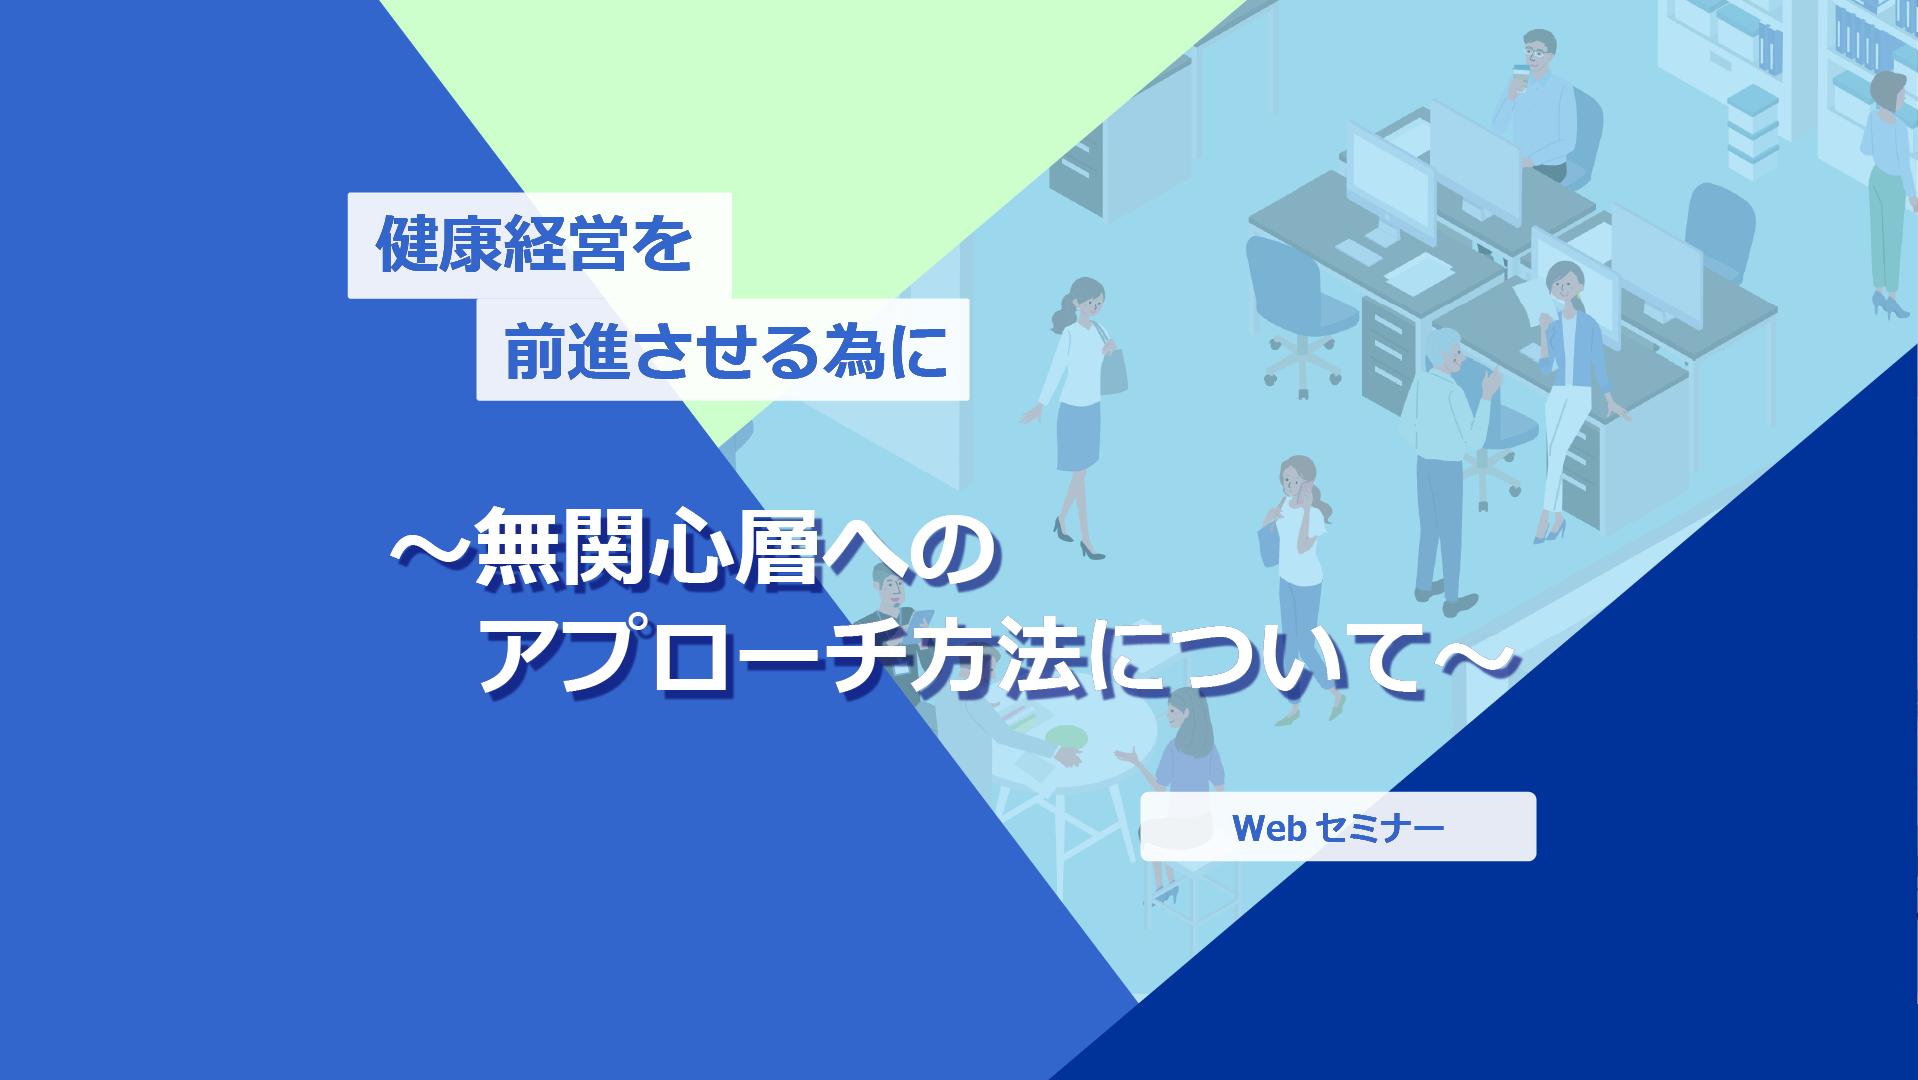 【Webセミナー】10/ 7開催!健康経営を前進させる為に~無関心層へのアプローチ方法ついて~